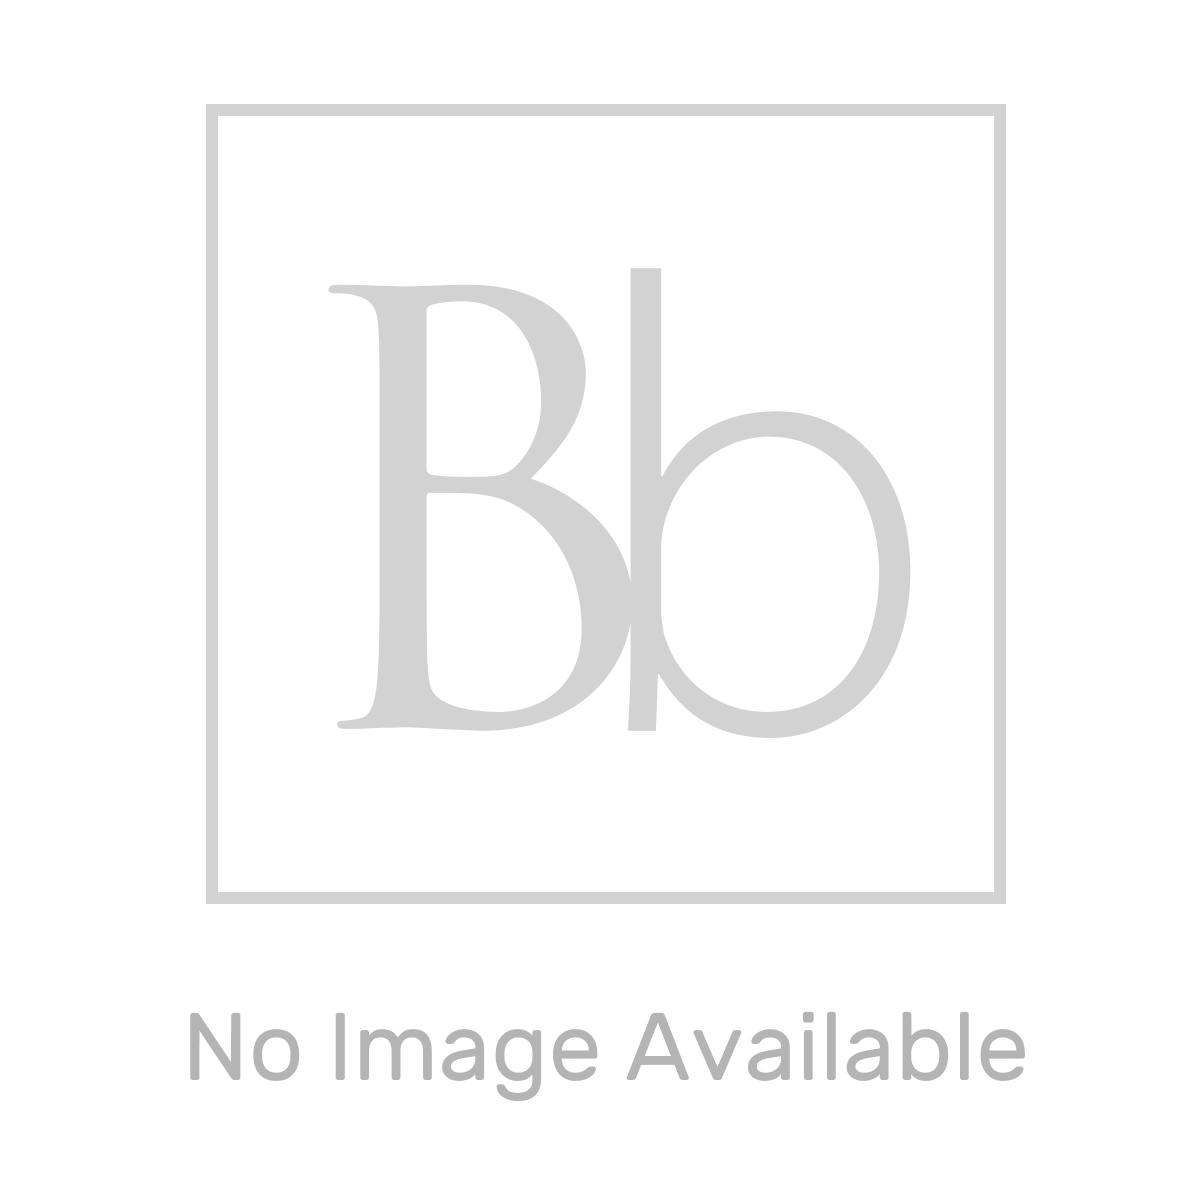 Stuart Turner 46553 CH 4-30 Centrifugal Multistage 2.5 Bar Pump Right